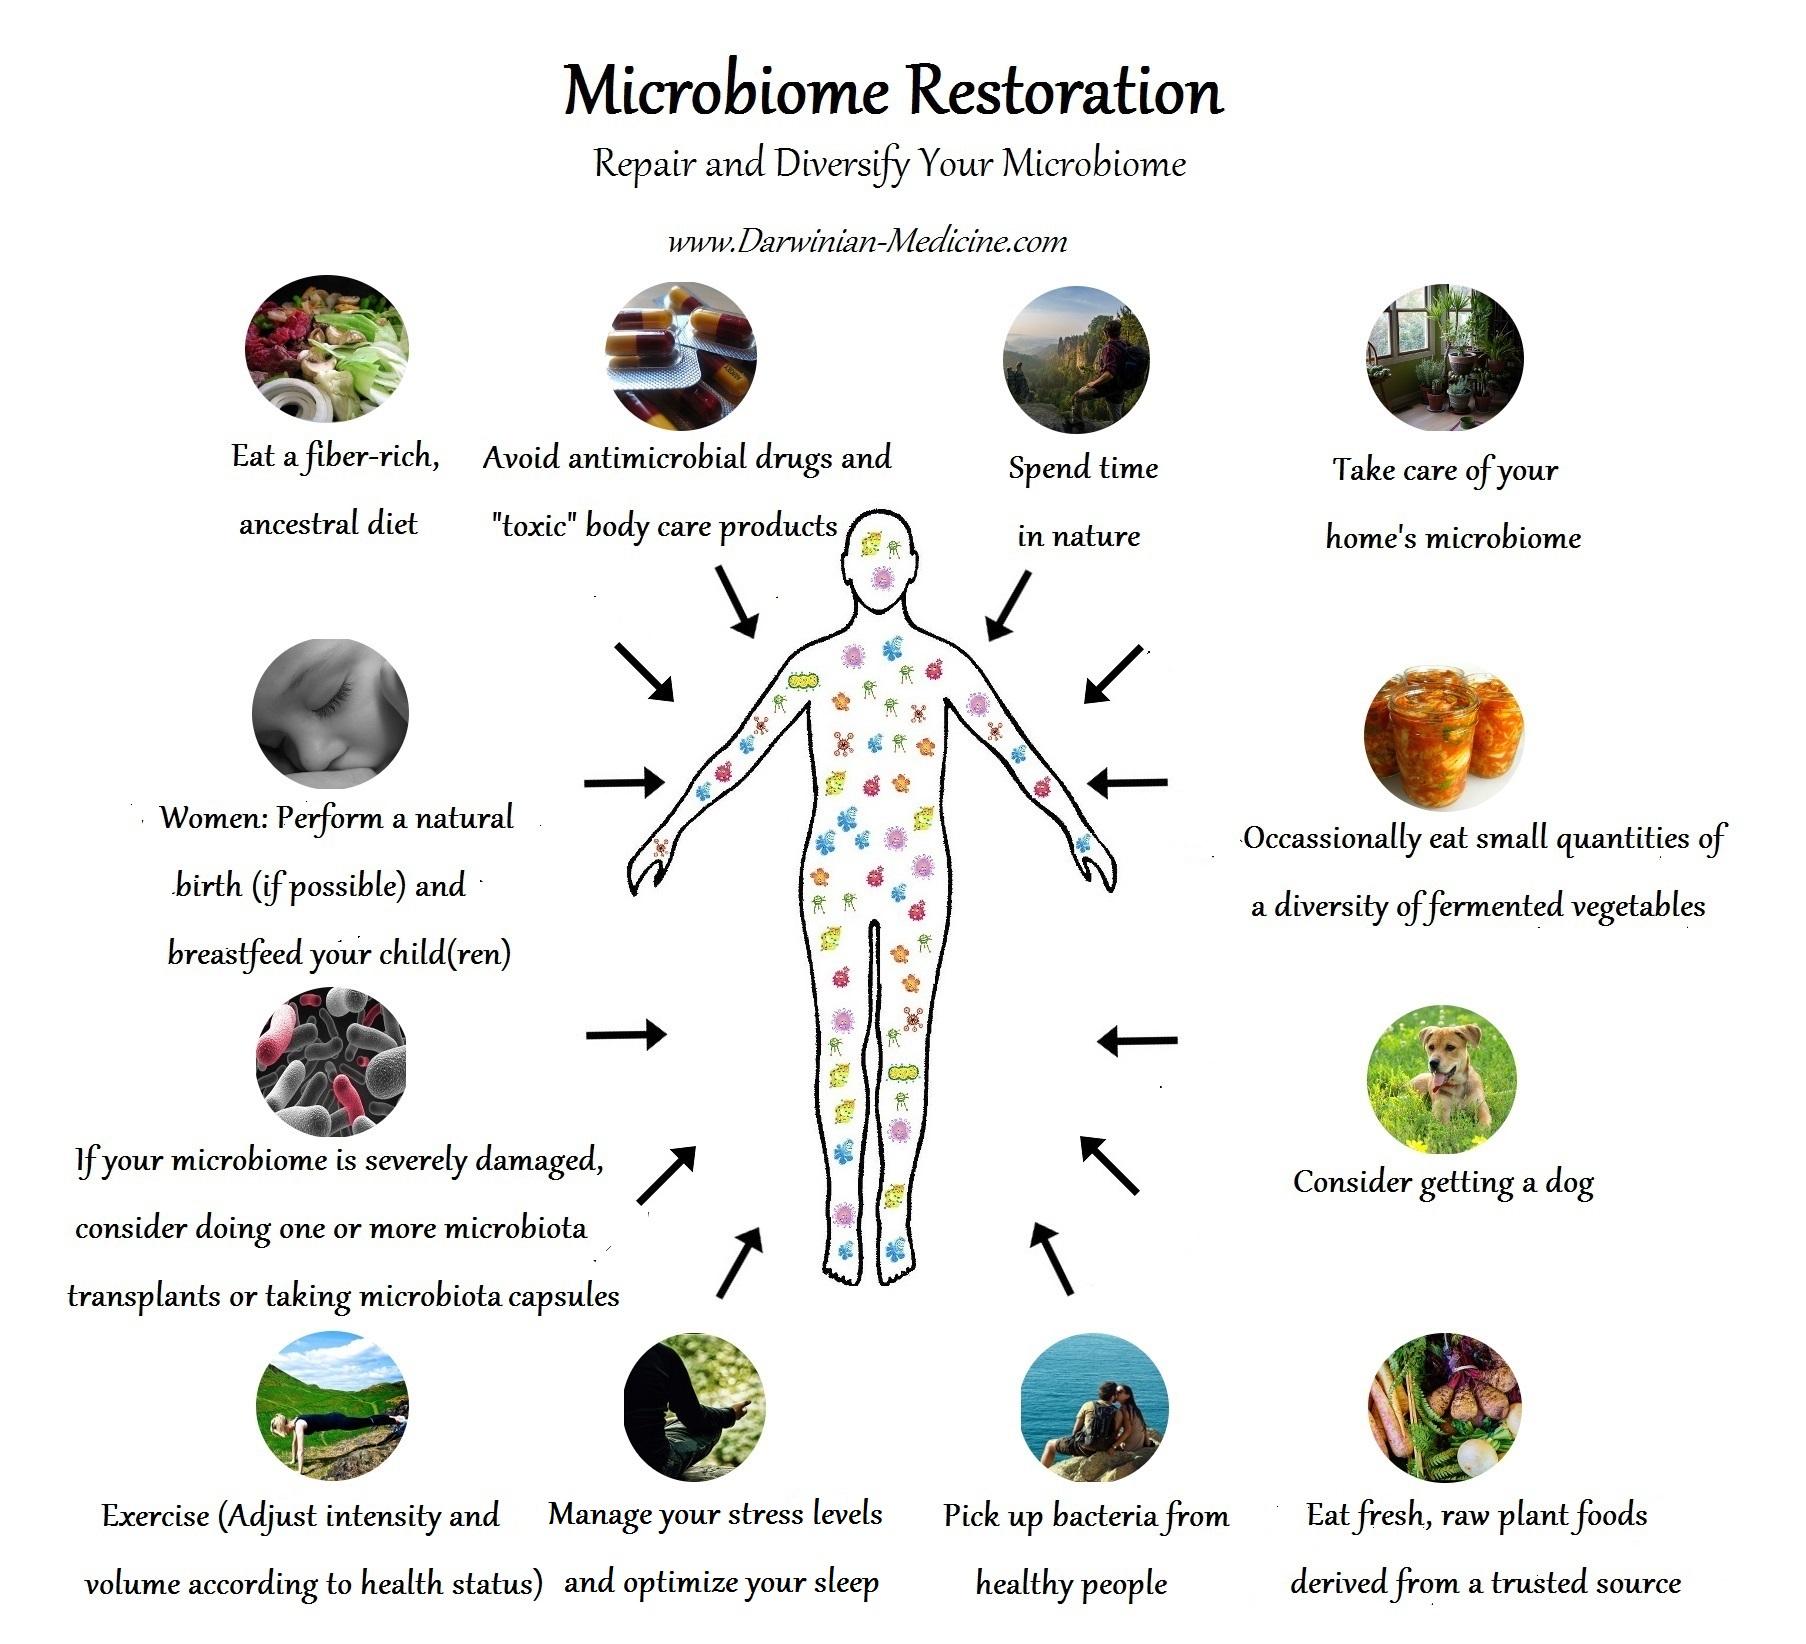 microbiome-restoration